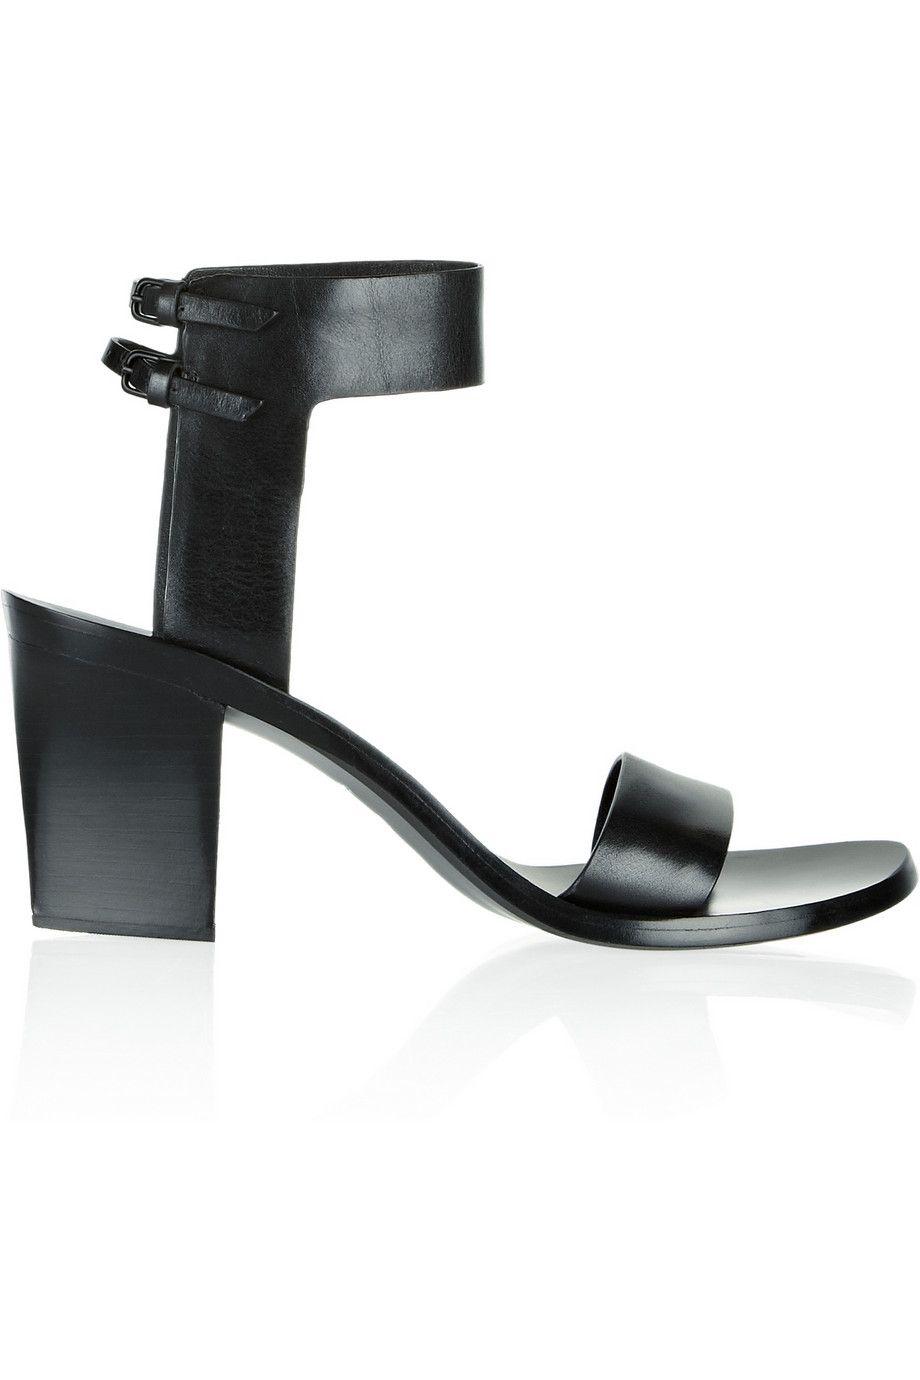 Alexander WangAriel cuffed leather sandals